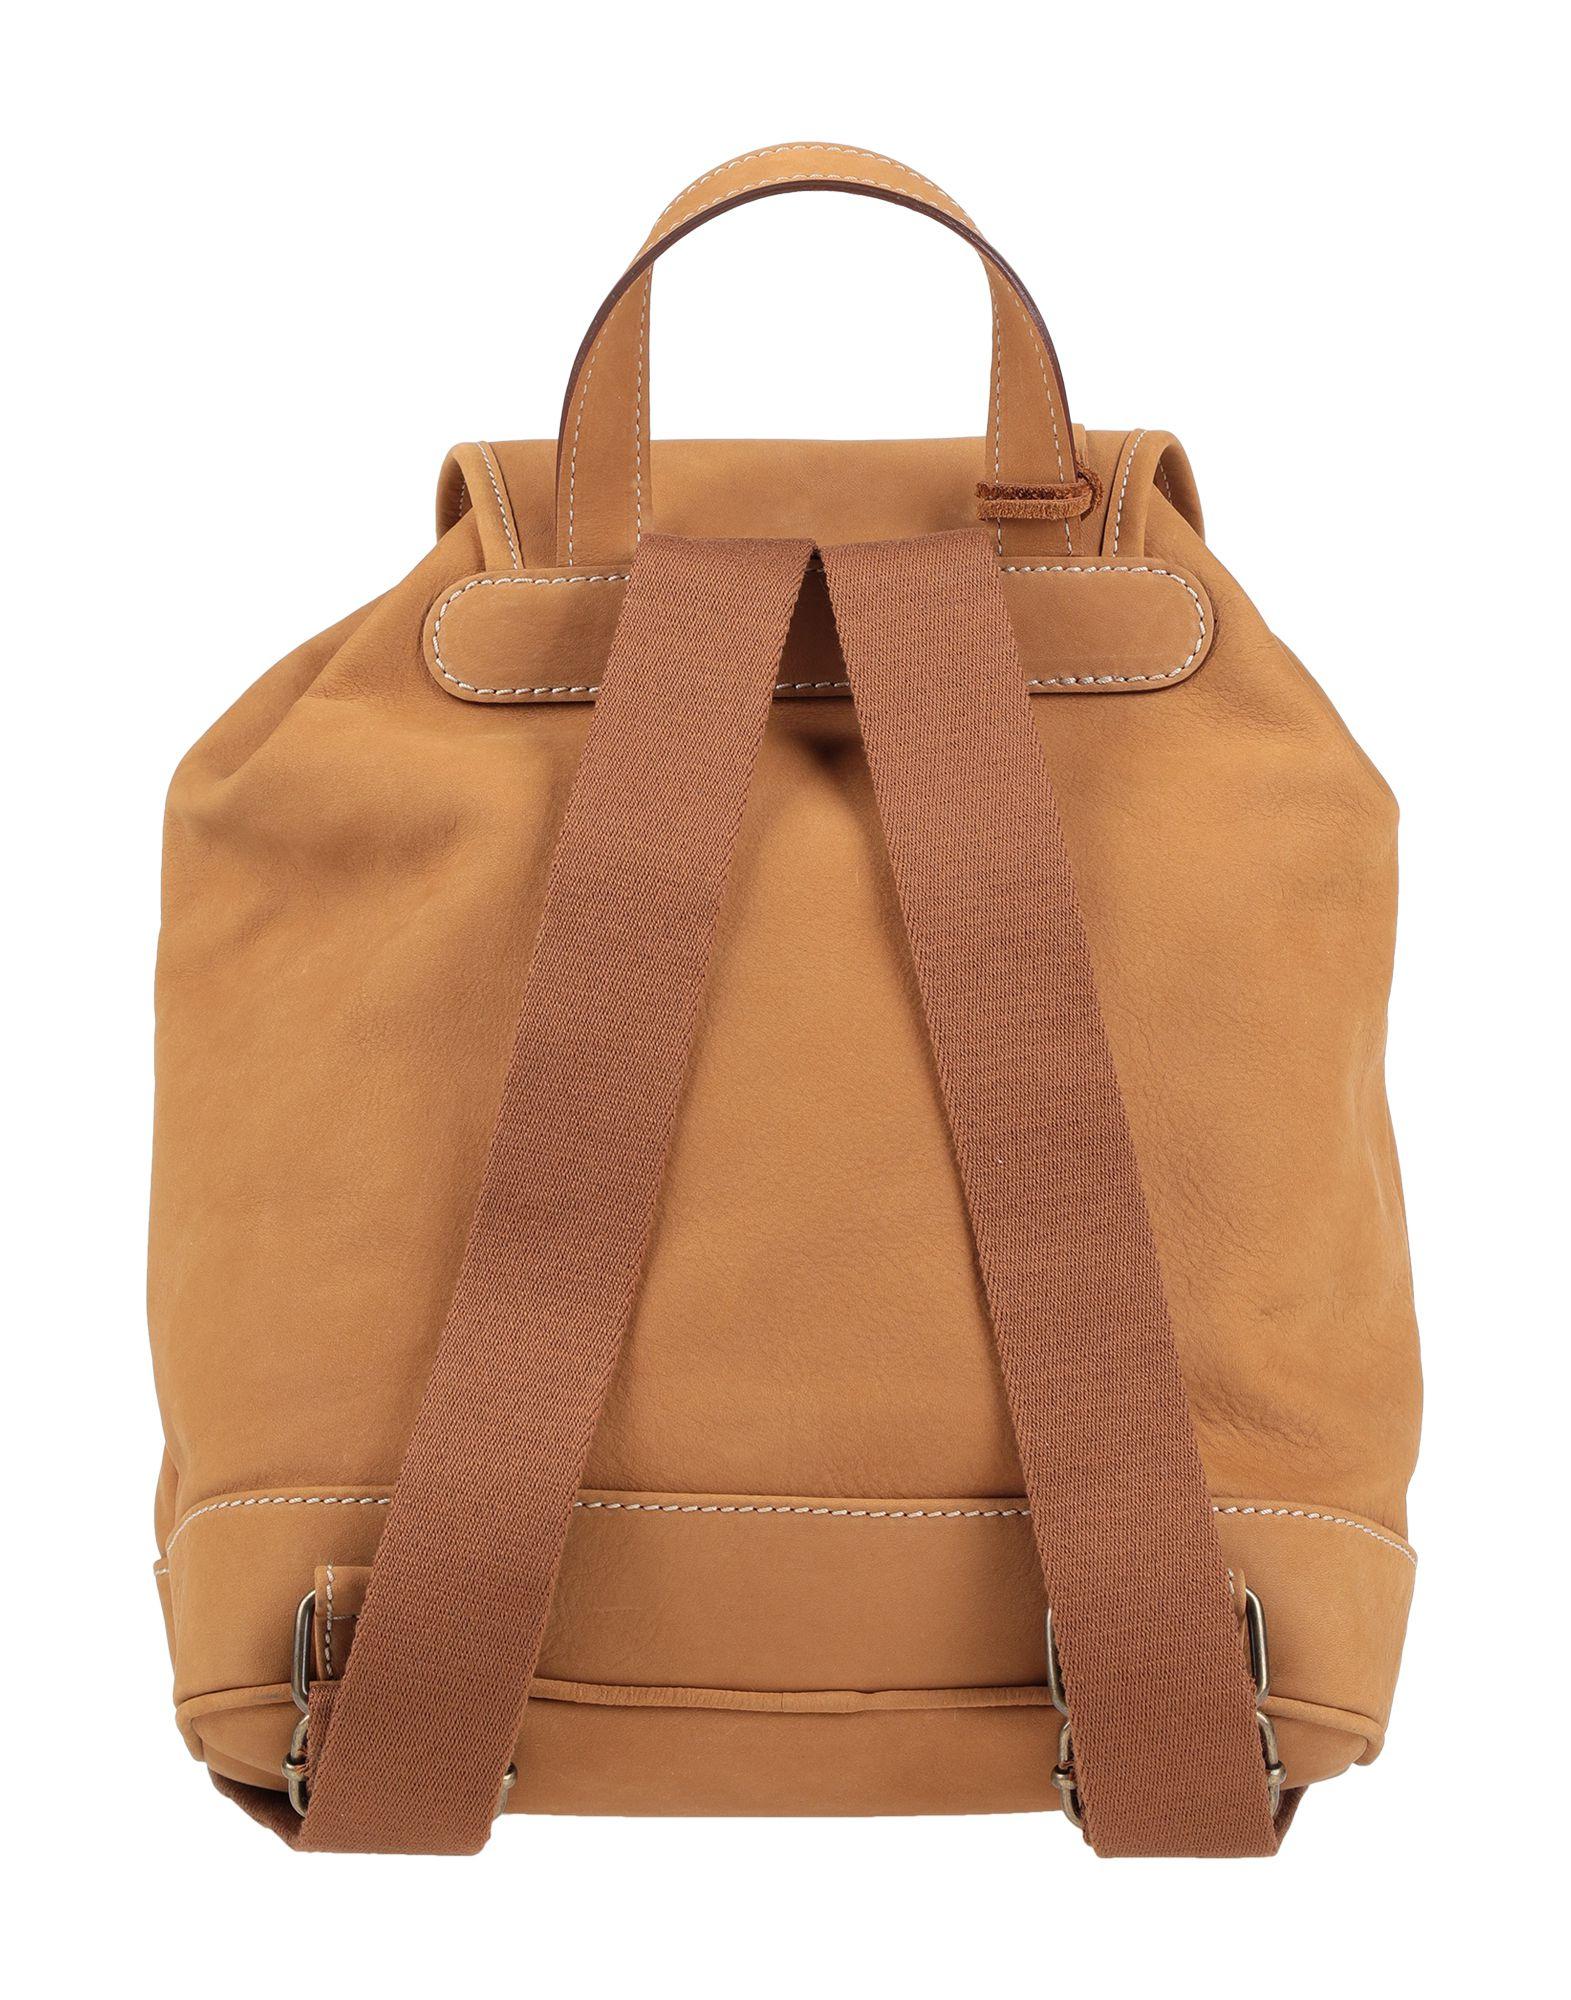 Timberland - Bags - Backpacks & Bum Bags - On Yoox.com